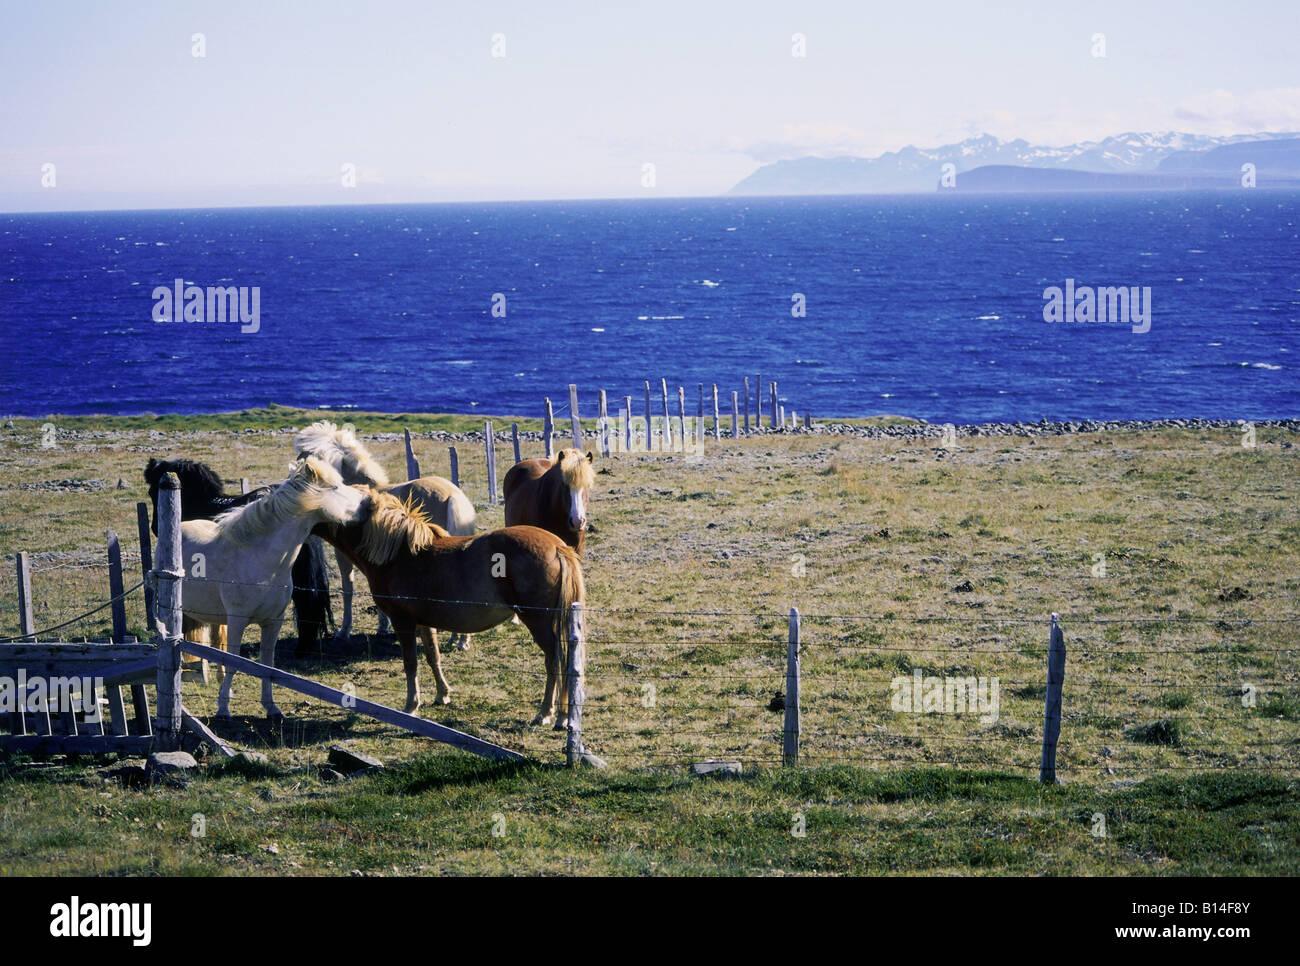 Geografia / viaggi, Islanda, paesaggi, Hrutafoerdur Fjord, islandese cavalli su willow, Additional-Rights-Clearance Immagini Stock